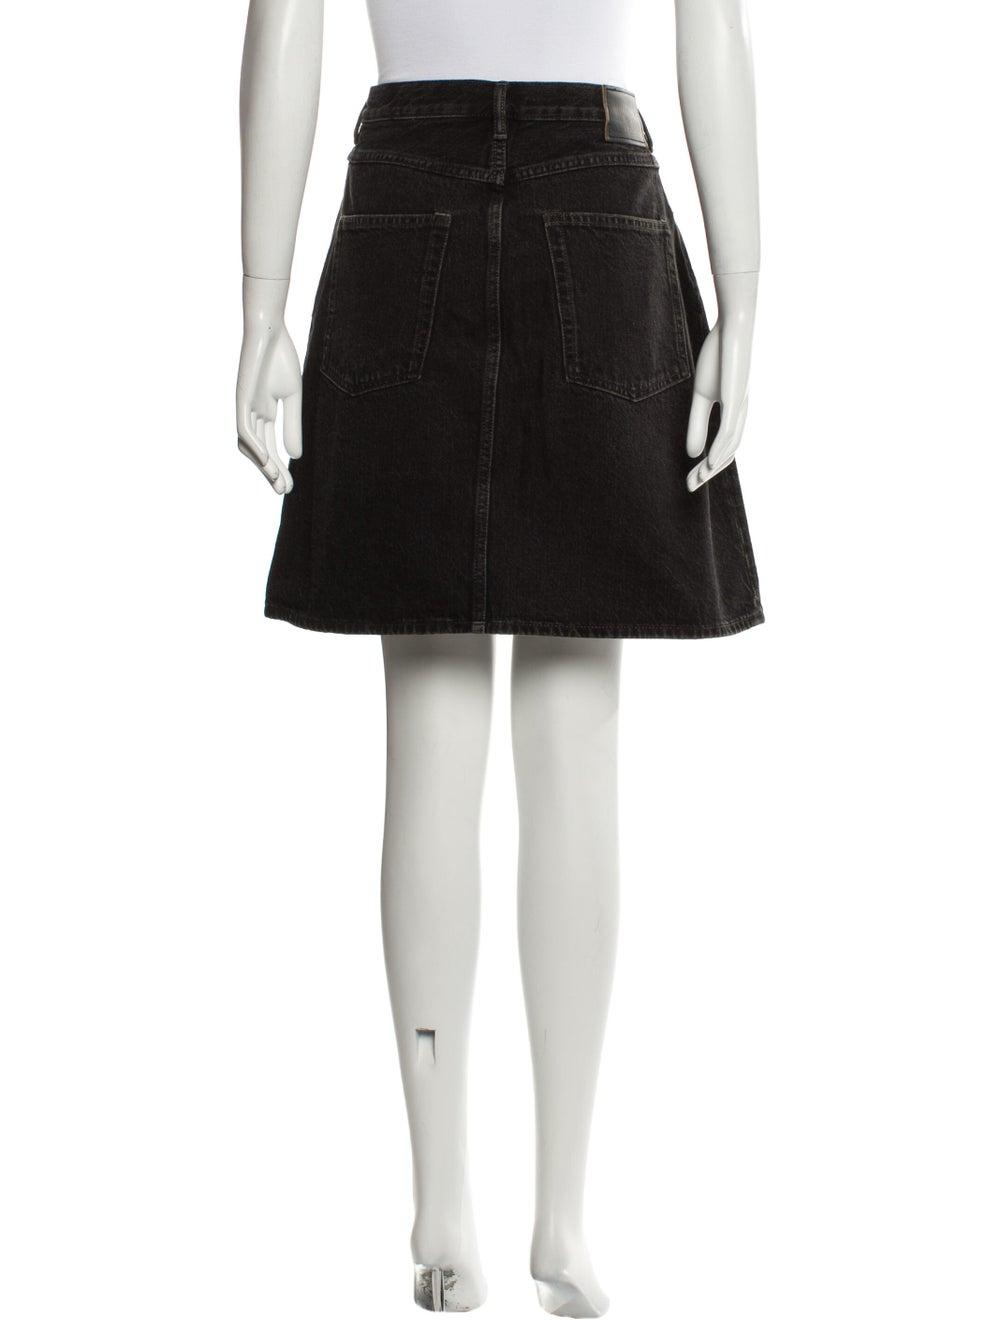 Acne Studios Mini Skirt Black - image 3